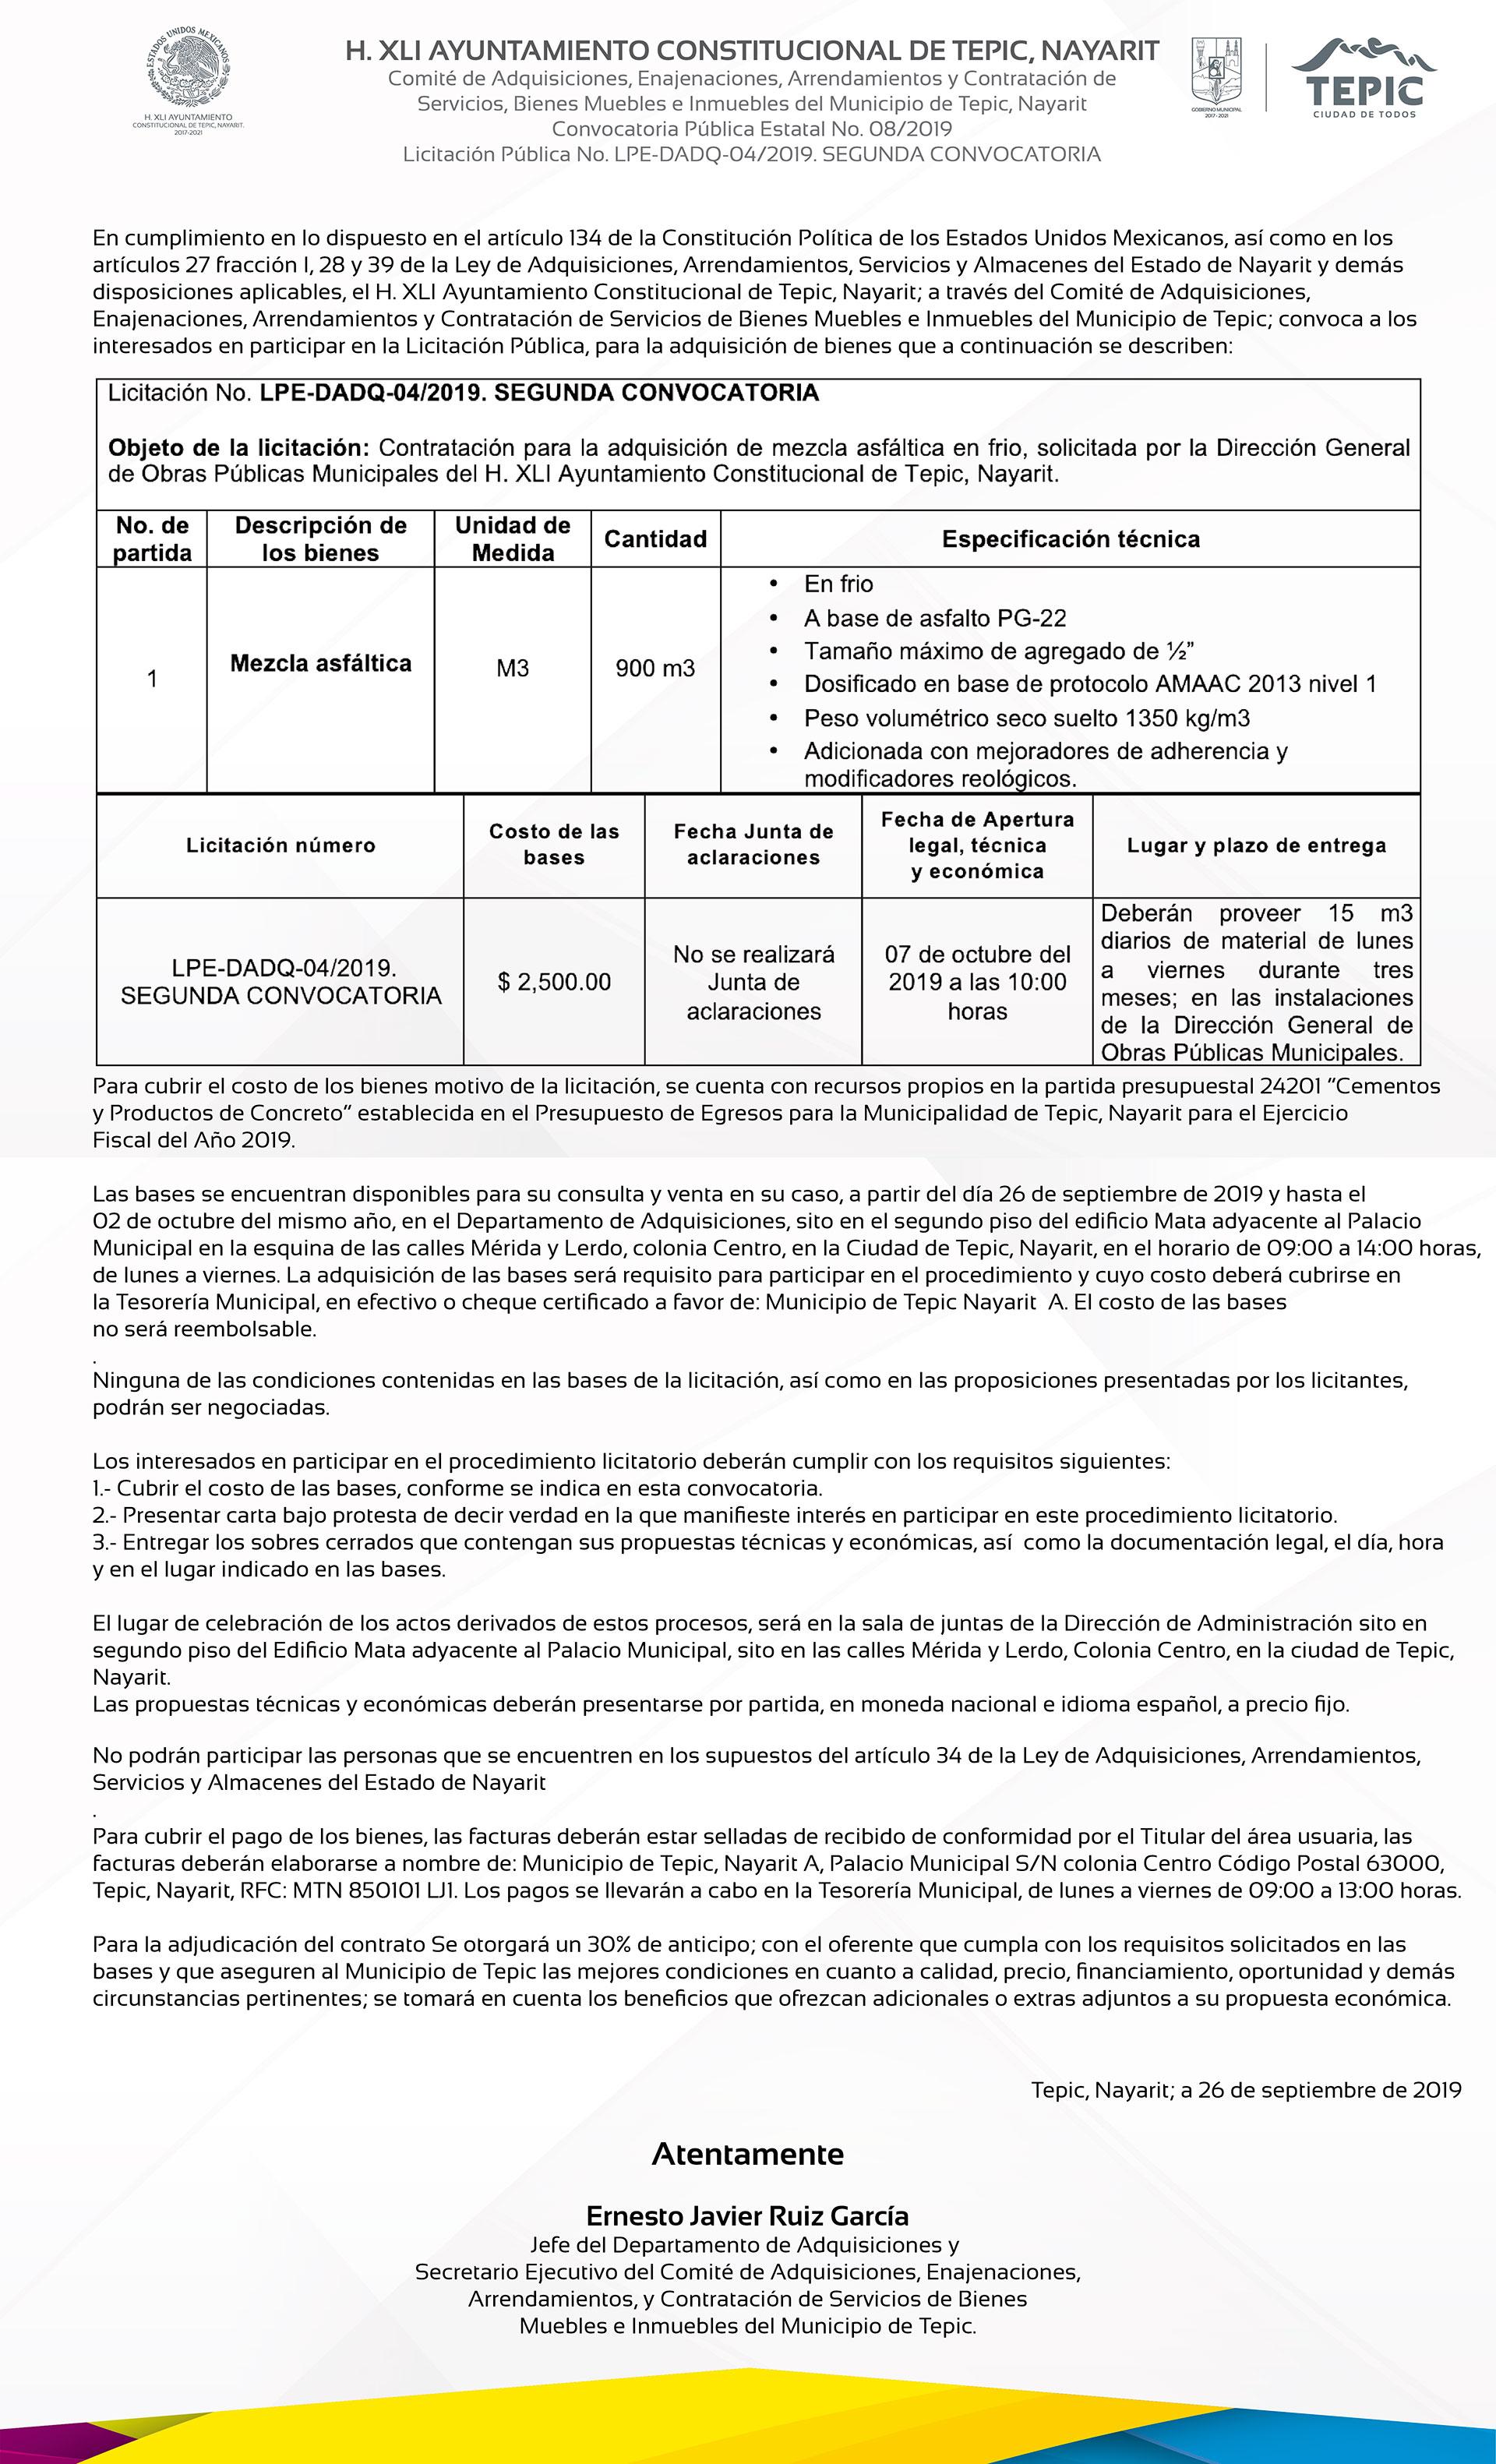 convocatoria-6_Mesa-de-trabajo-1